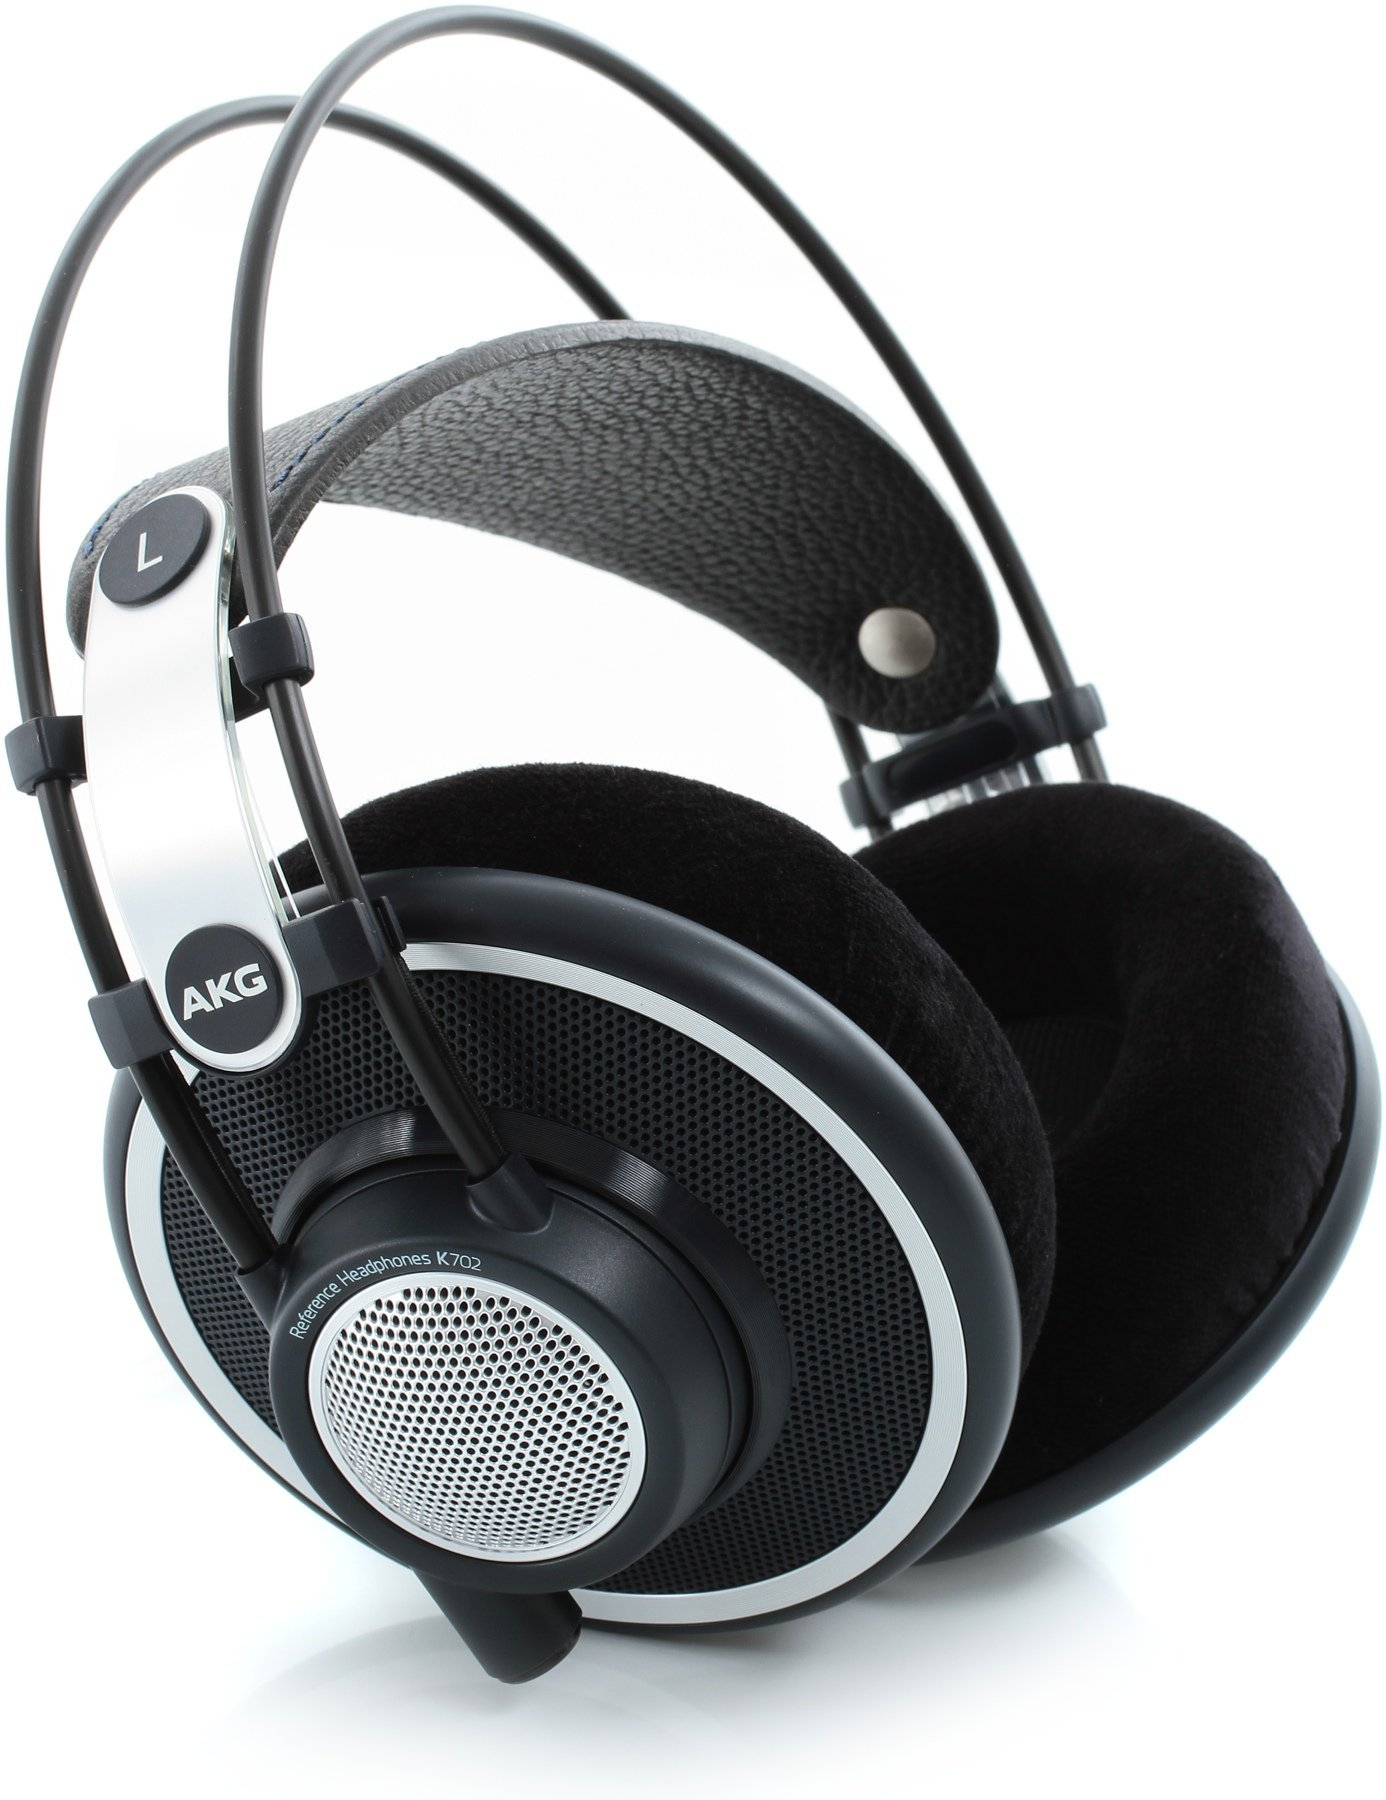 AKG Pro Audio Professional Headphones, Black, 1/4'' to 1/8'' (K702) by AKG Pro Audio